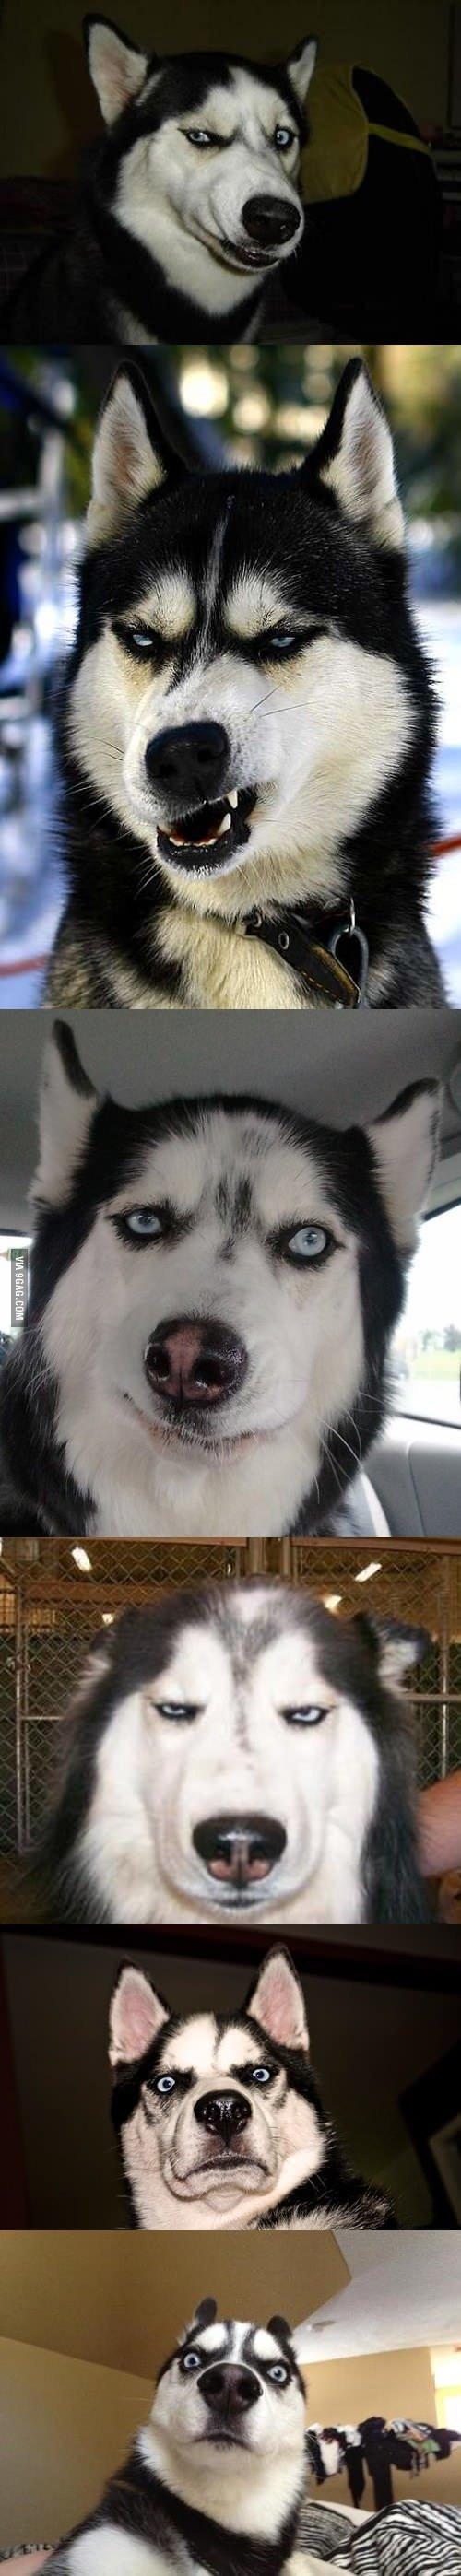 Husky's make the best faces. . Husky's make the best faces